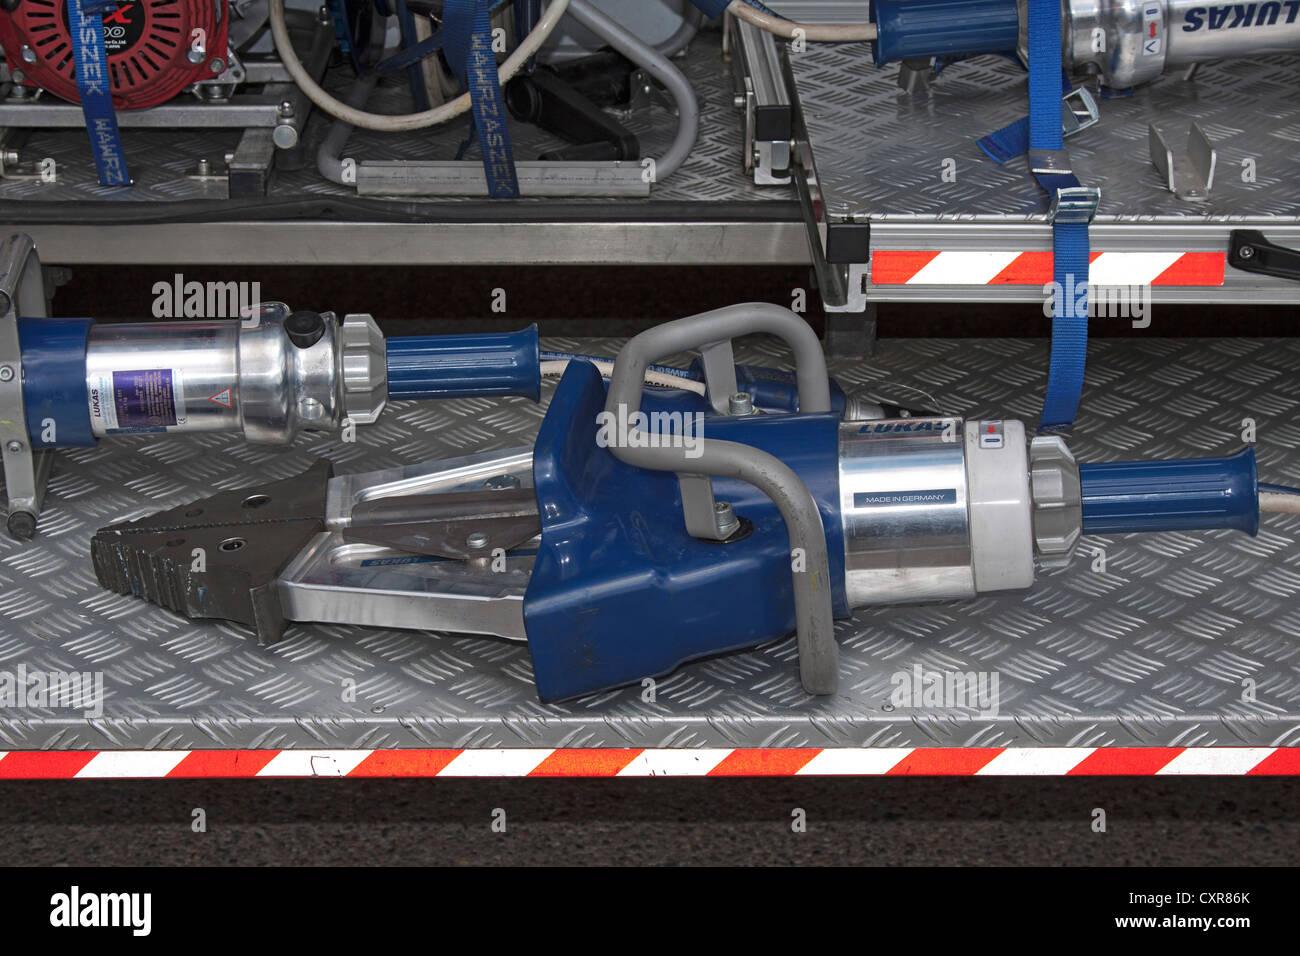 Spreader, rescue spreader, shears, hydraulic, tools, fire brigade - Stock Image